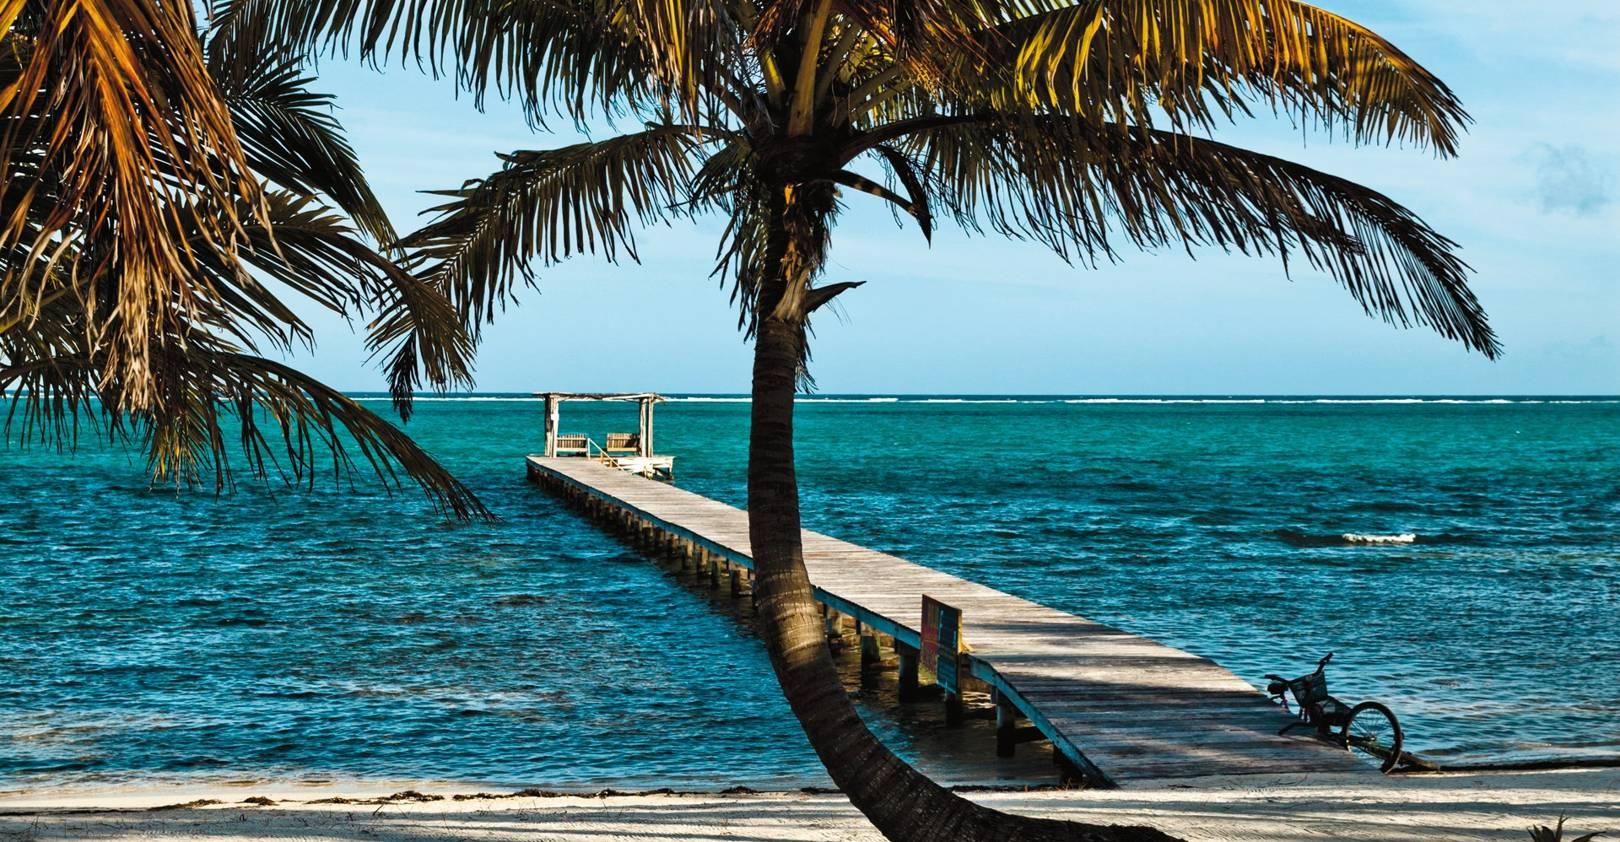 Beach-hopping in Belize